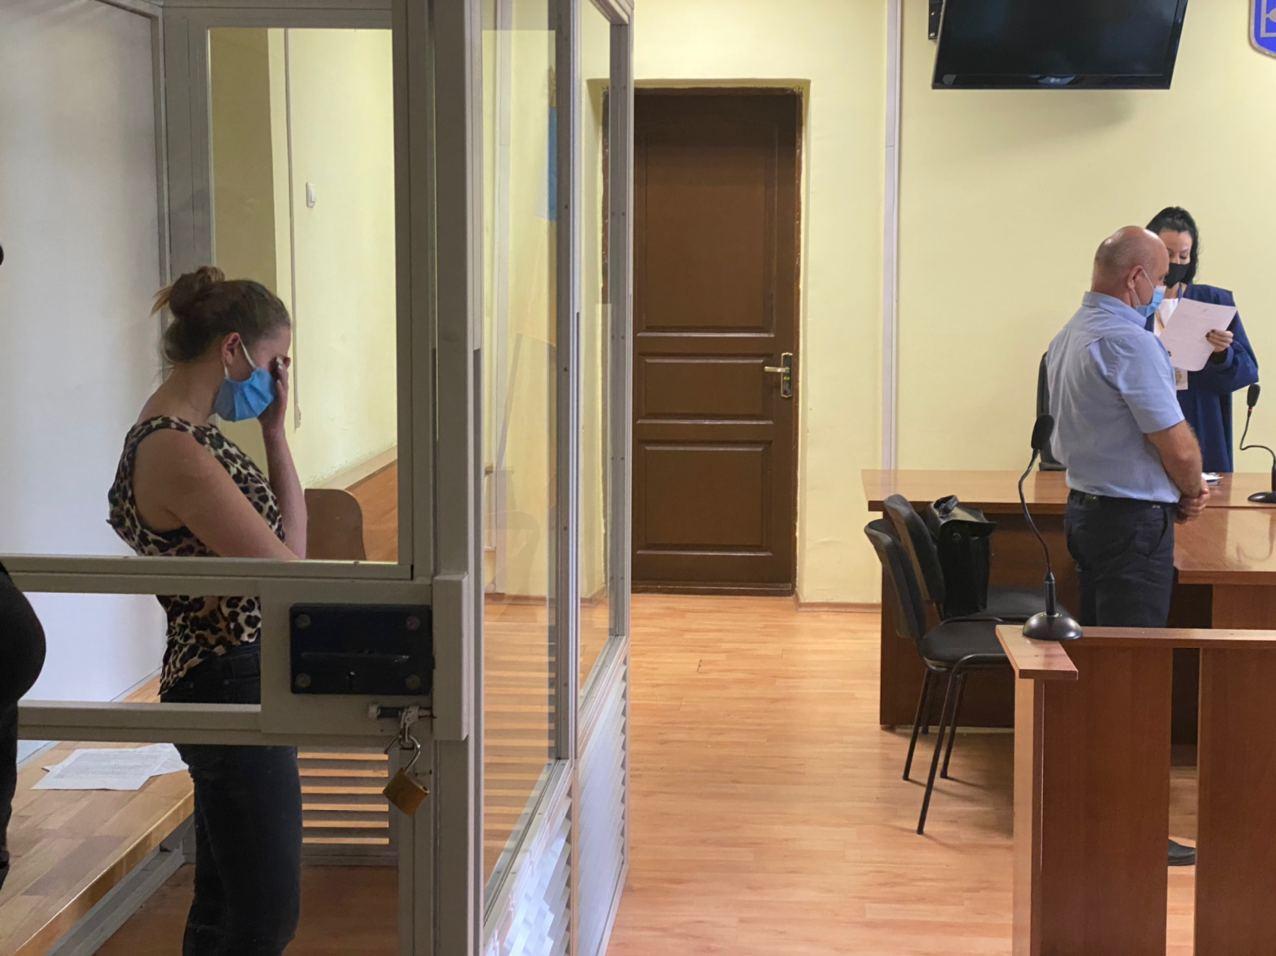 23-летнюю Марию Герман отправили в СИЗО на 60 суток без права внесения залога.